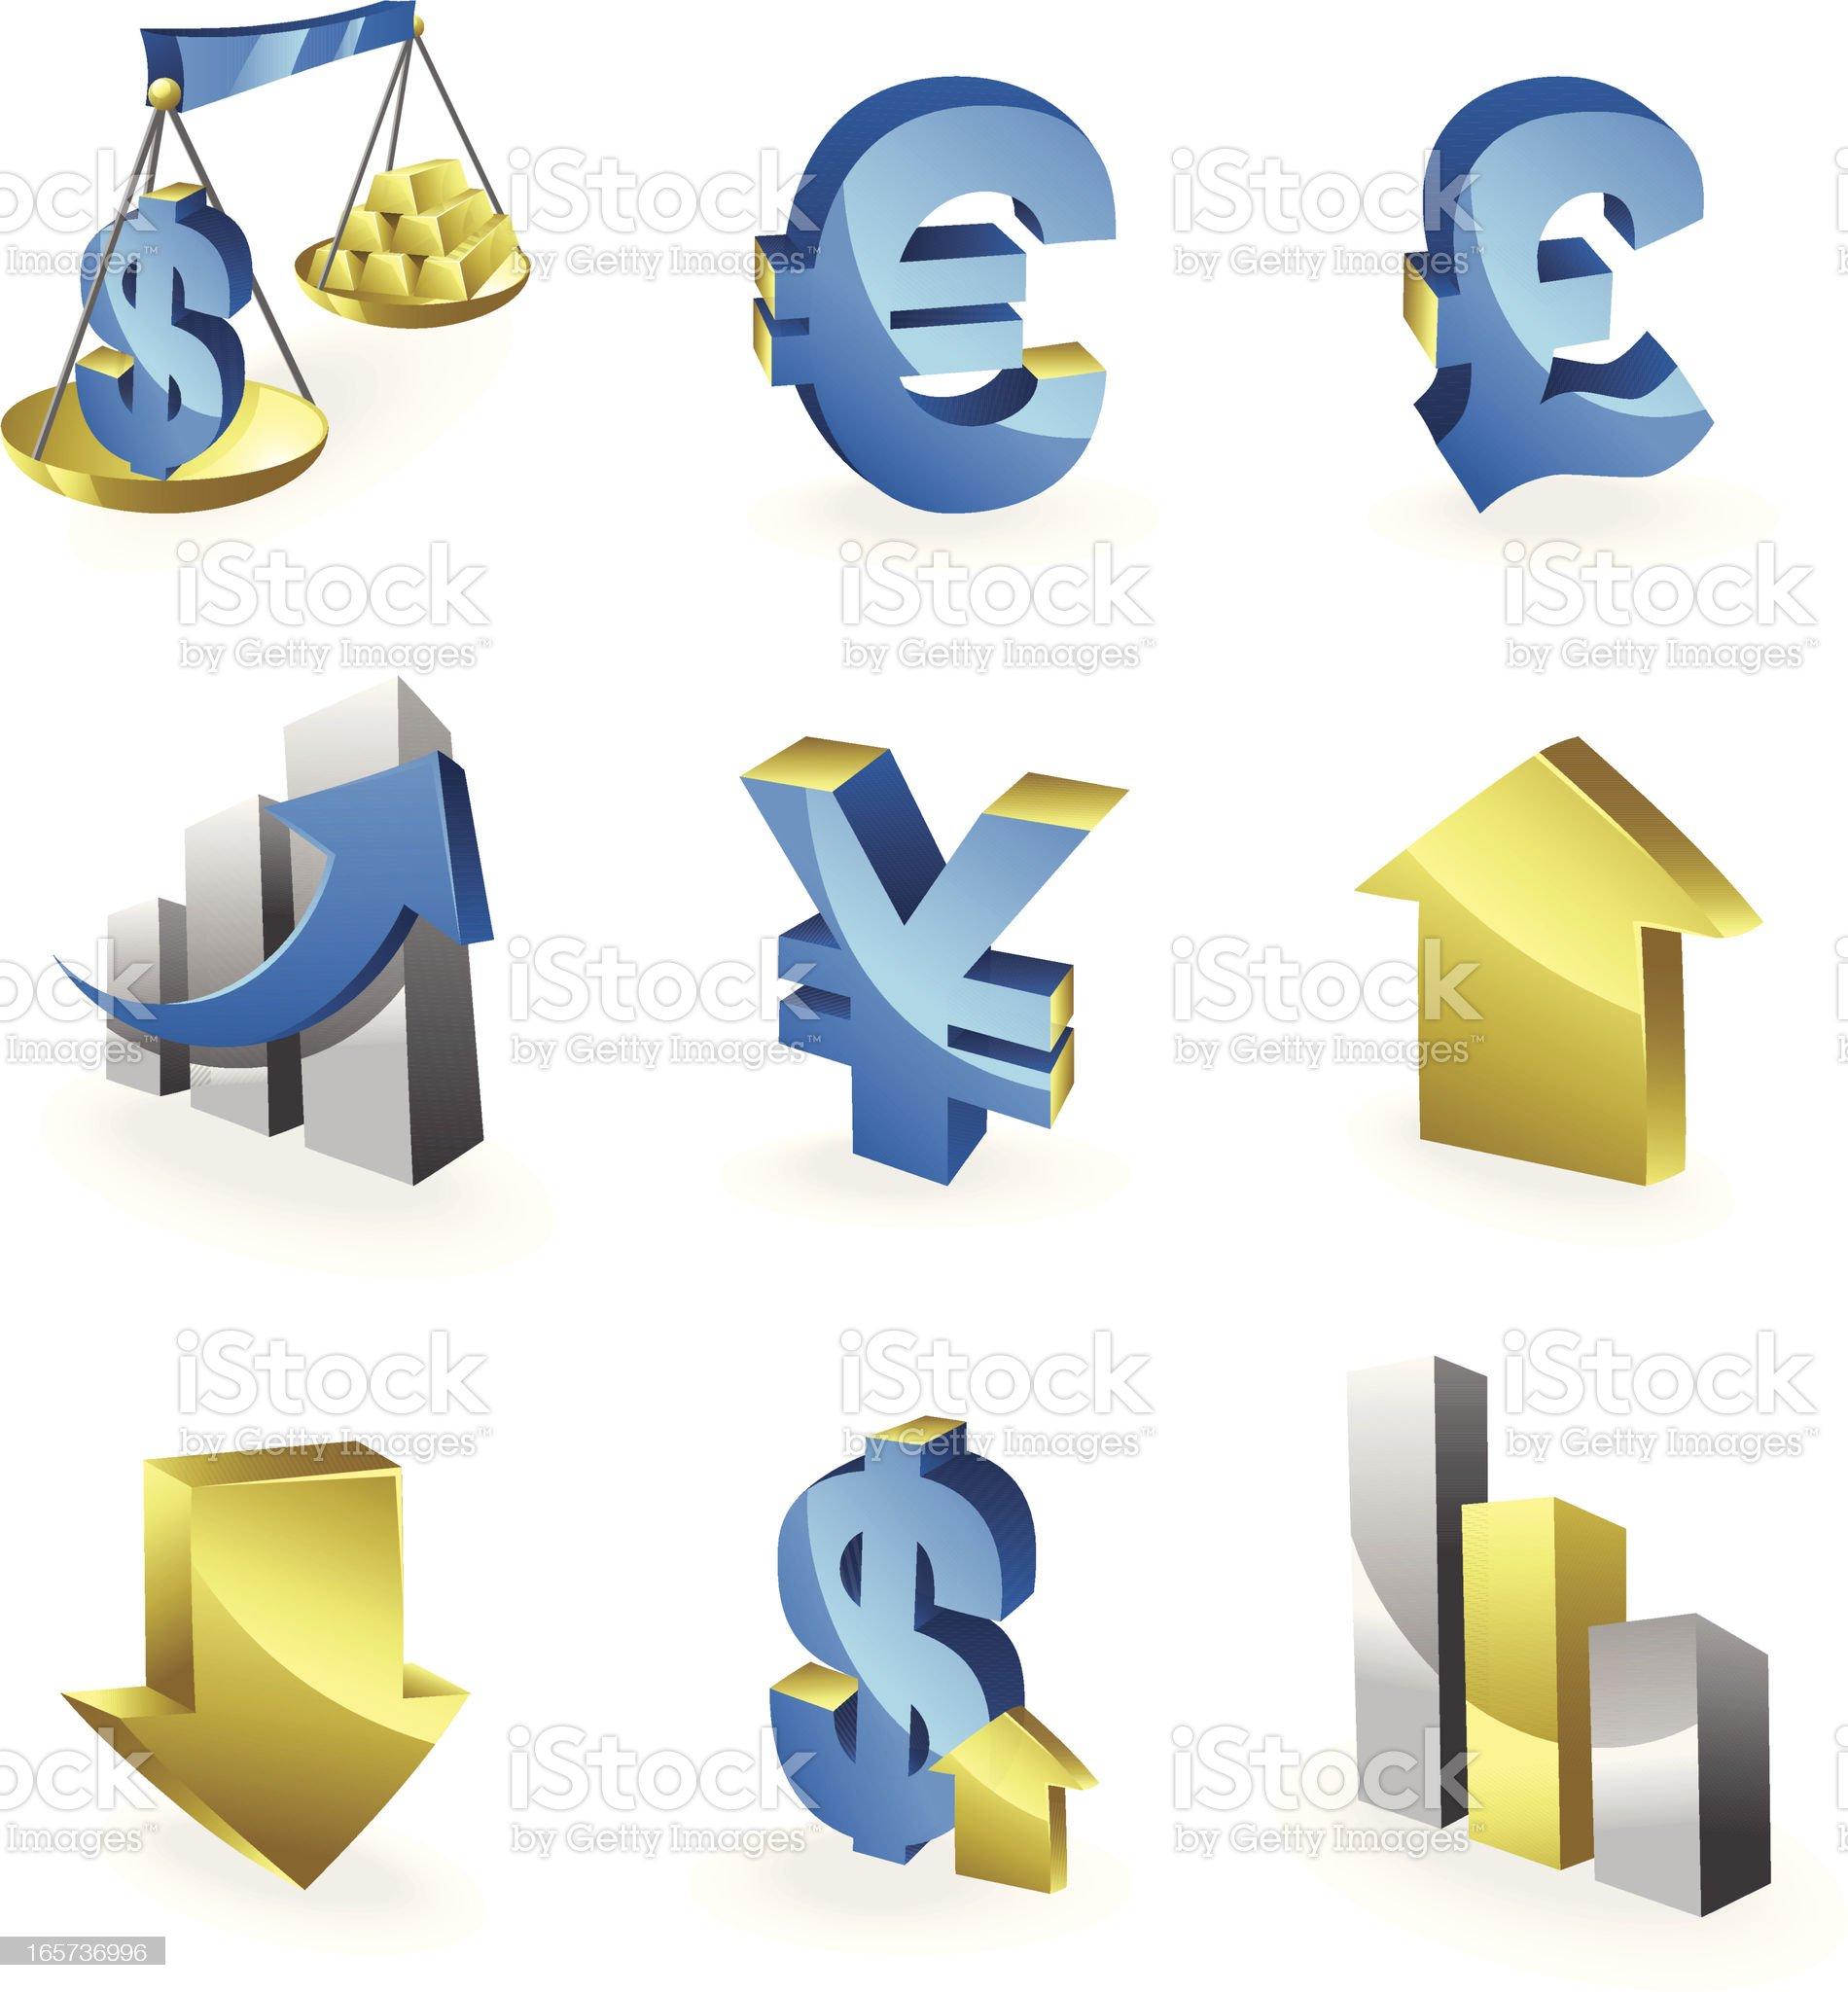 Finance Series royalty-free stock vector art